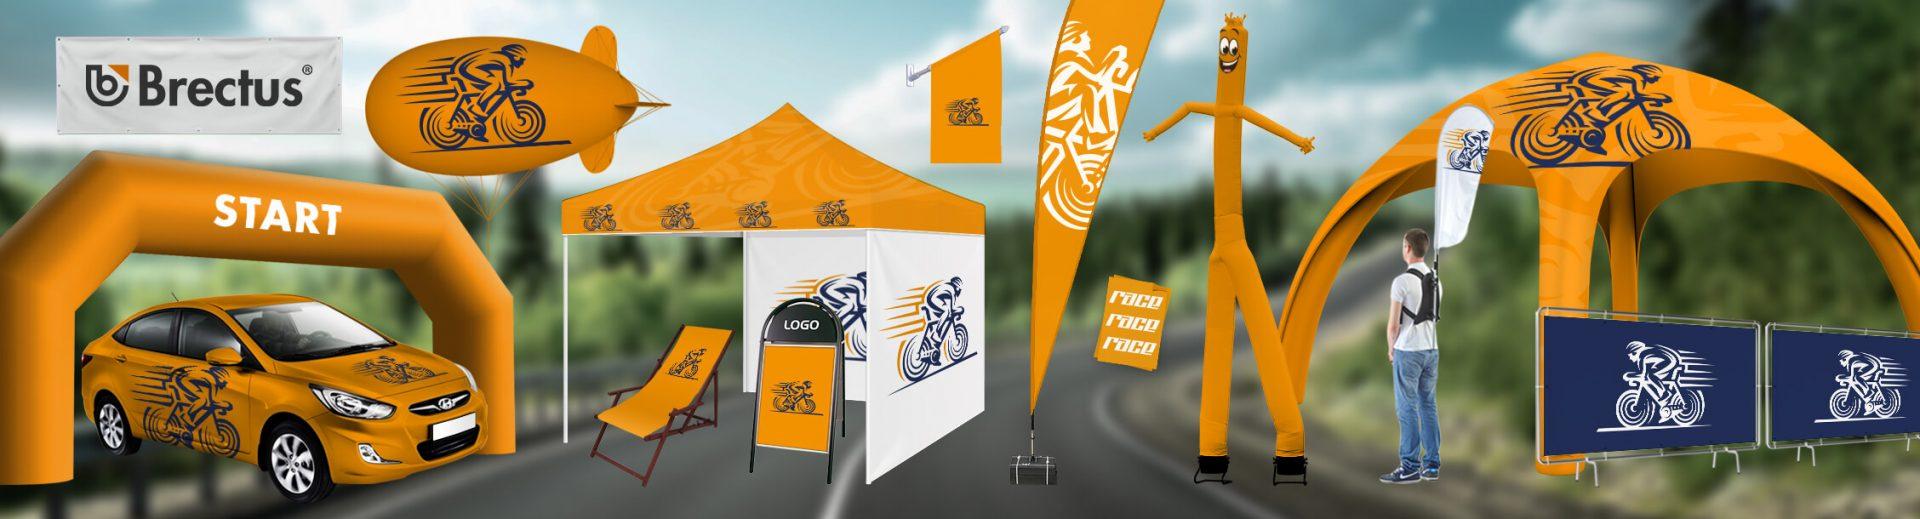 Cykellopp Brectus Arena Reklame